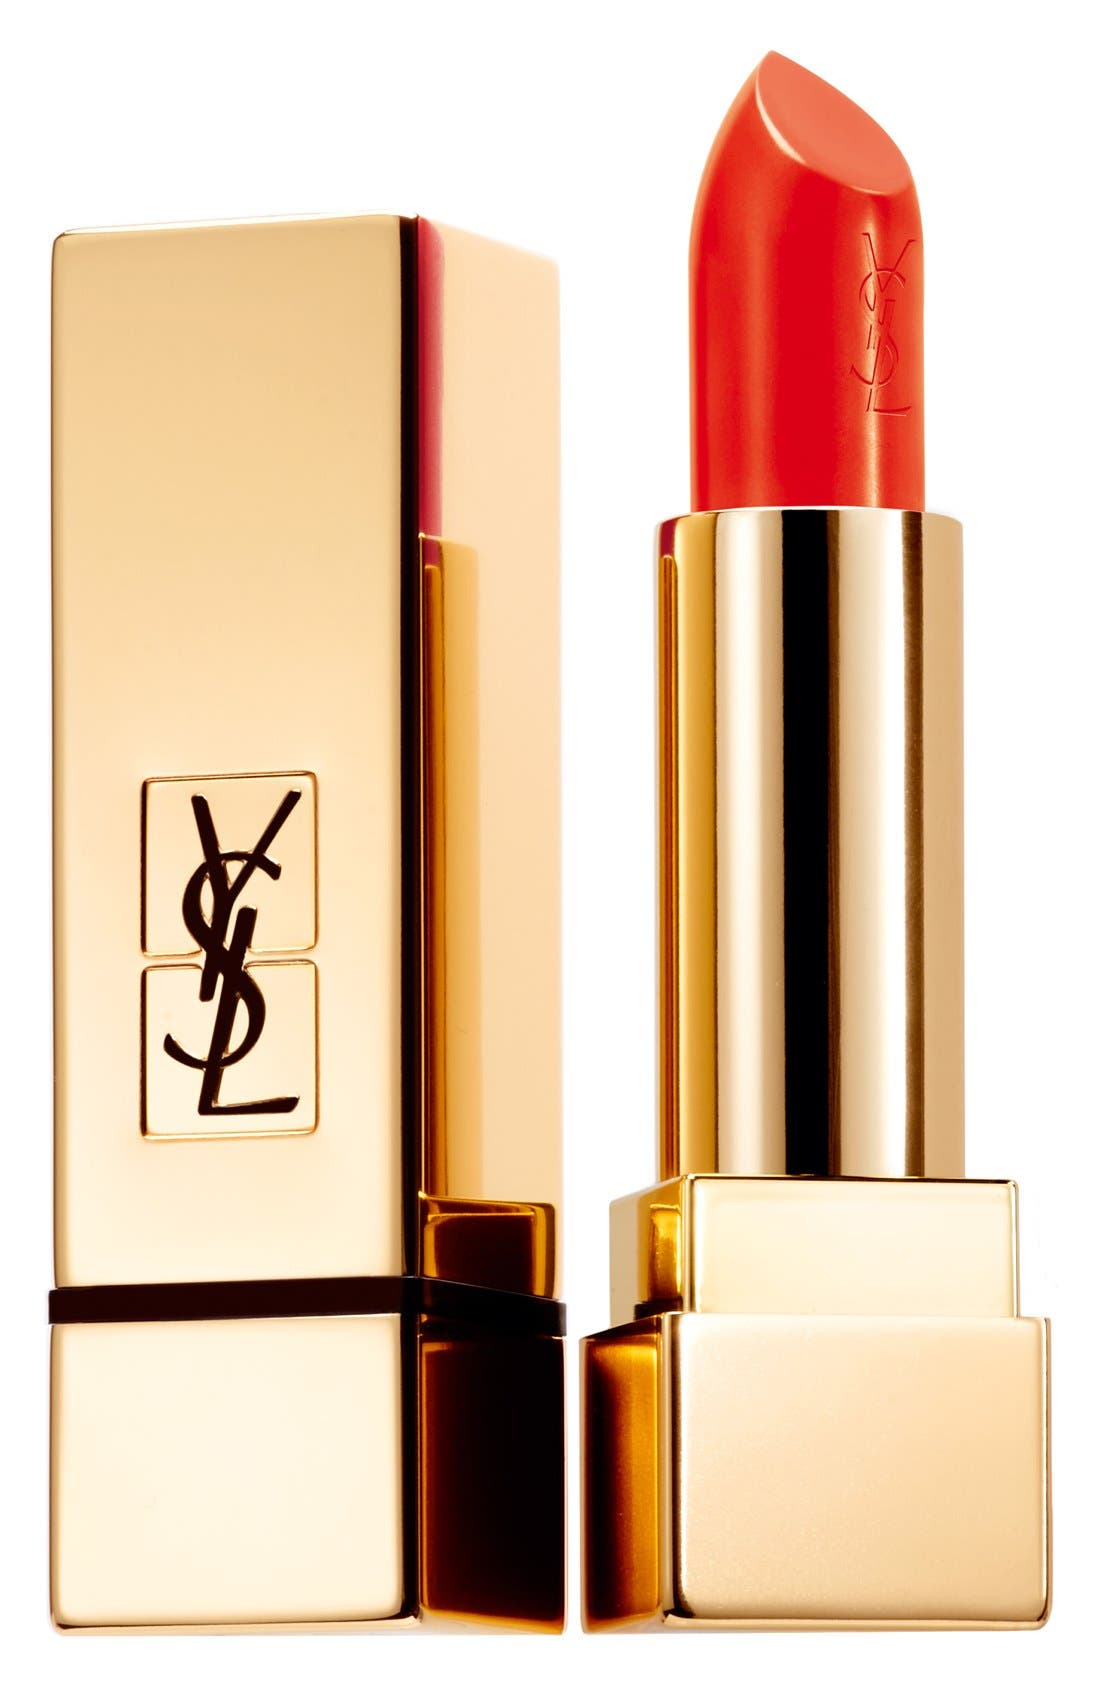 Yves Saint Laurent Rouge Pur Couture Satin Lipstick - 74 Orange Electro